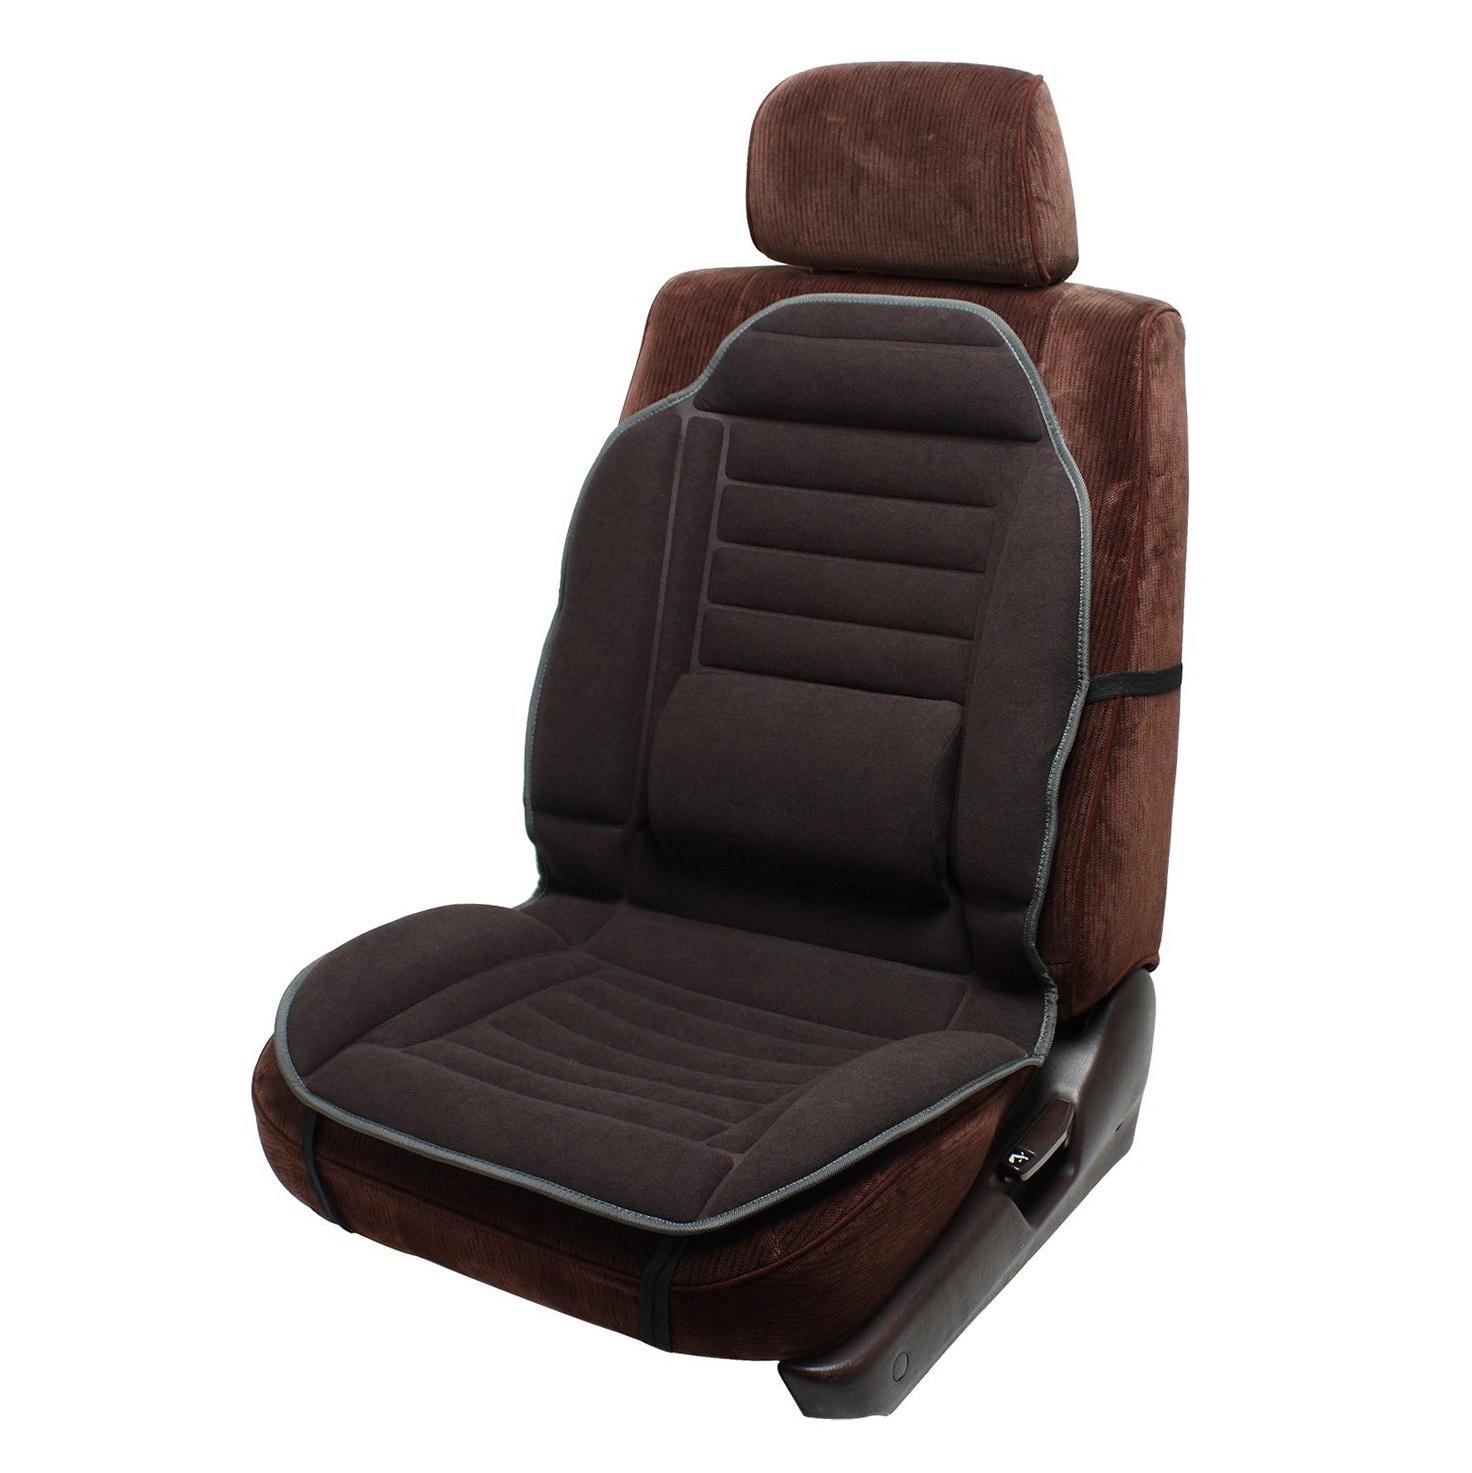 Office Chair Cushion Covers